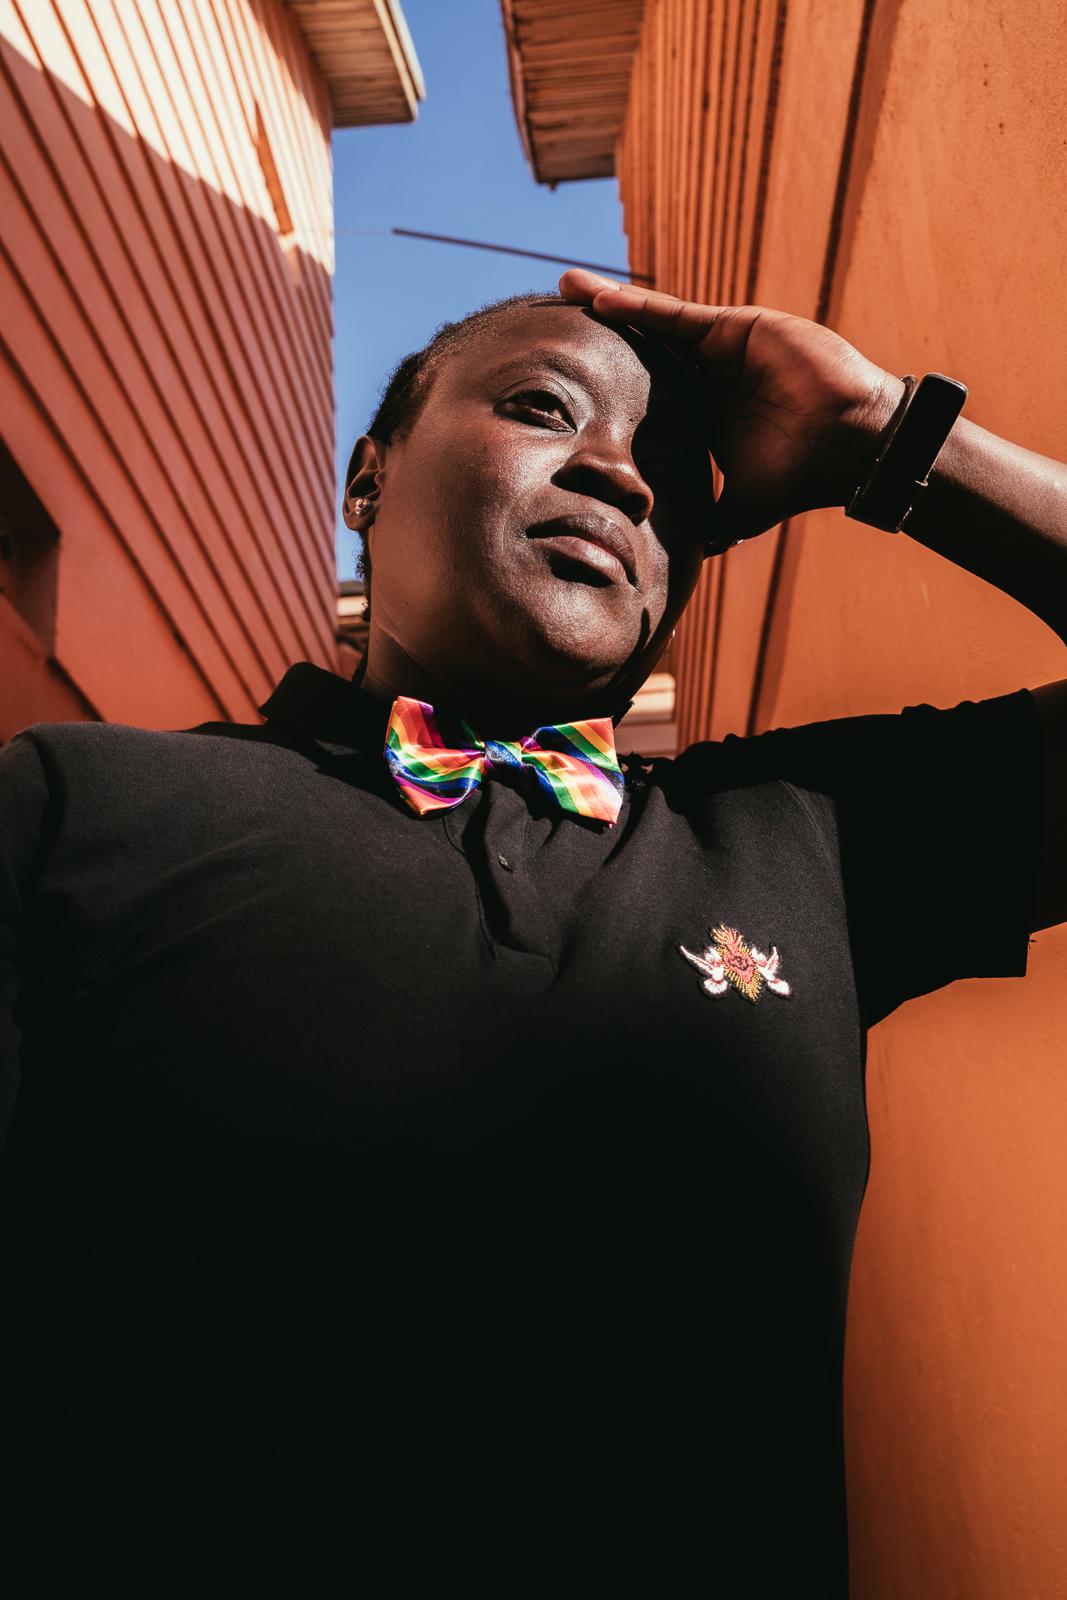 Queer_RebeccaRuetten_Uganda_Biggie_web-08787.jpg